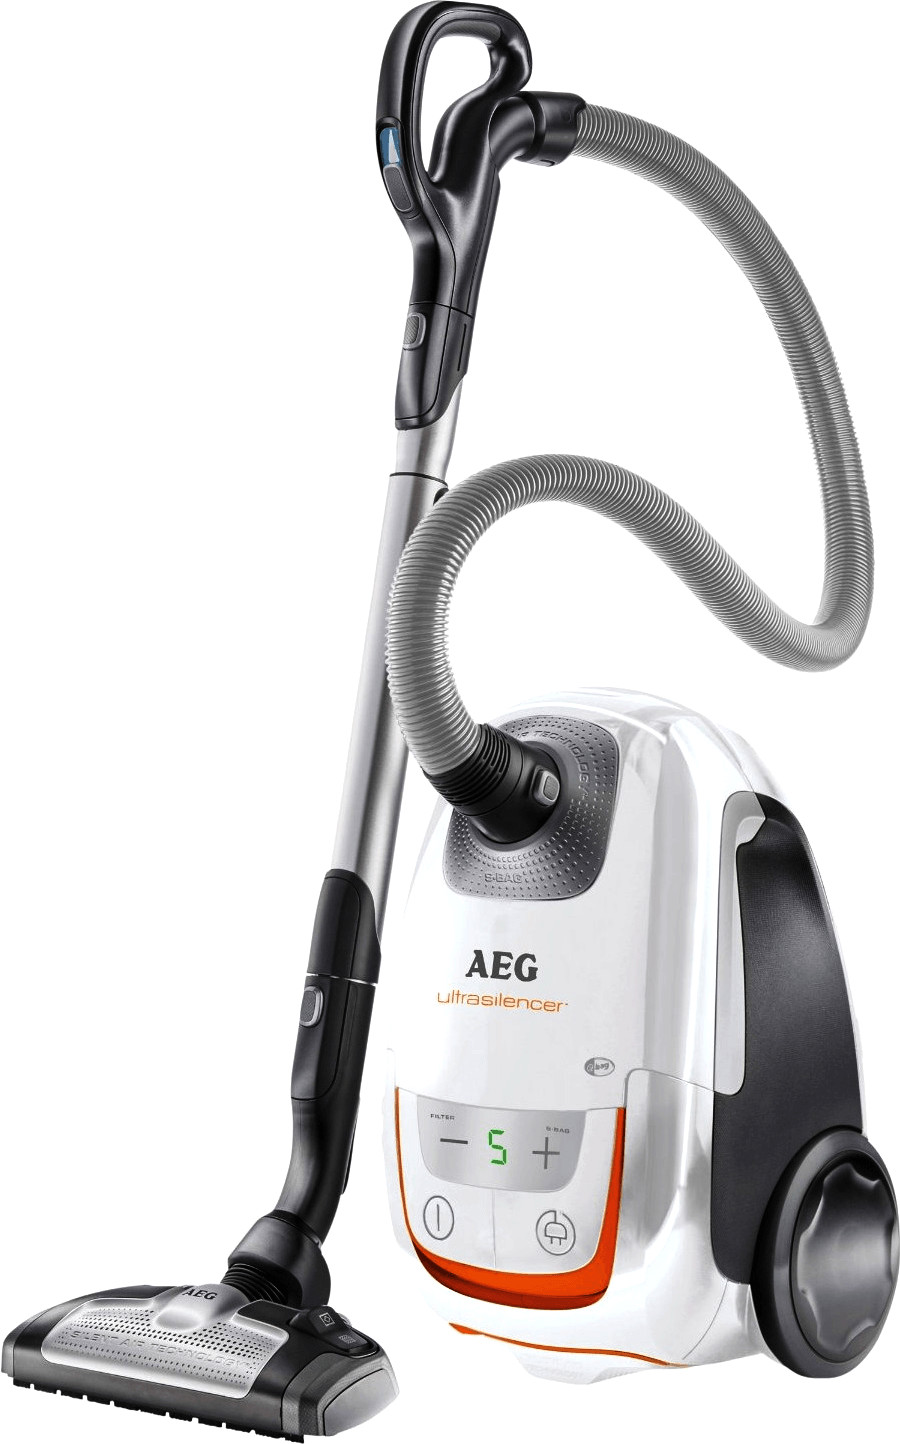 AEG AUS 8230 UltraSilencer